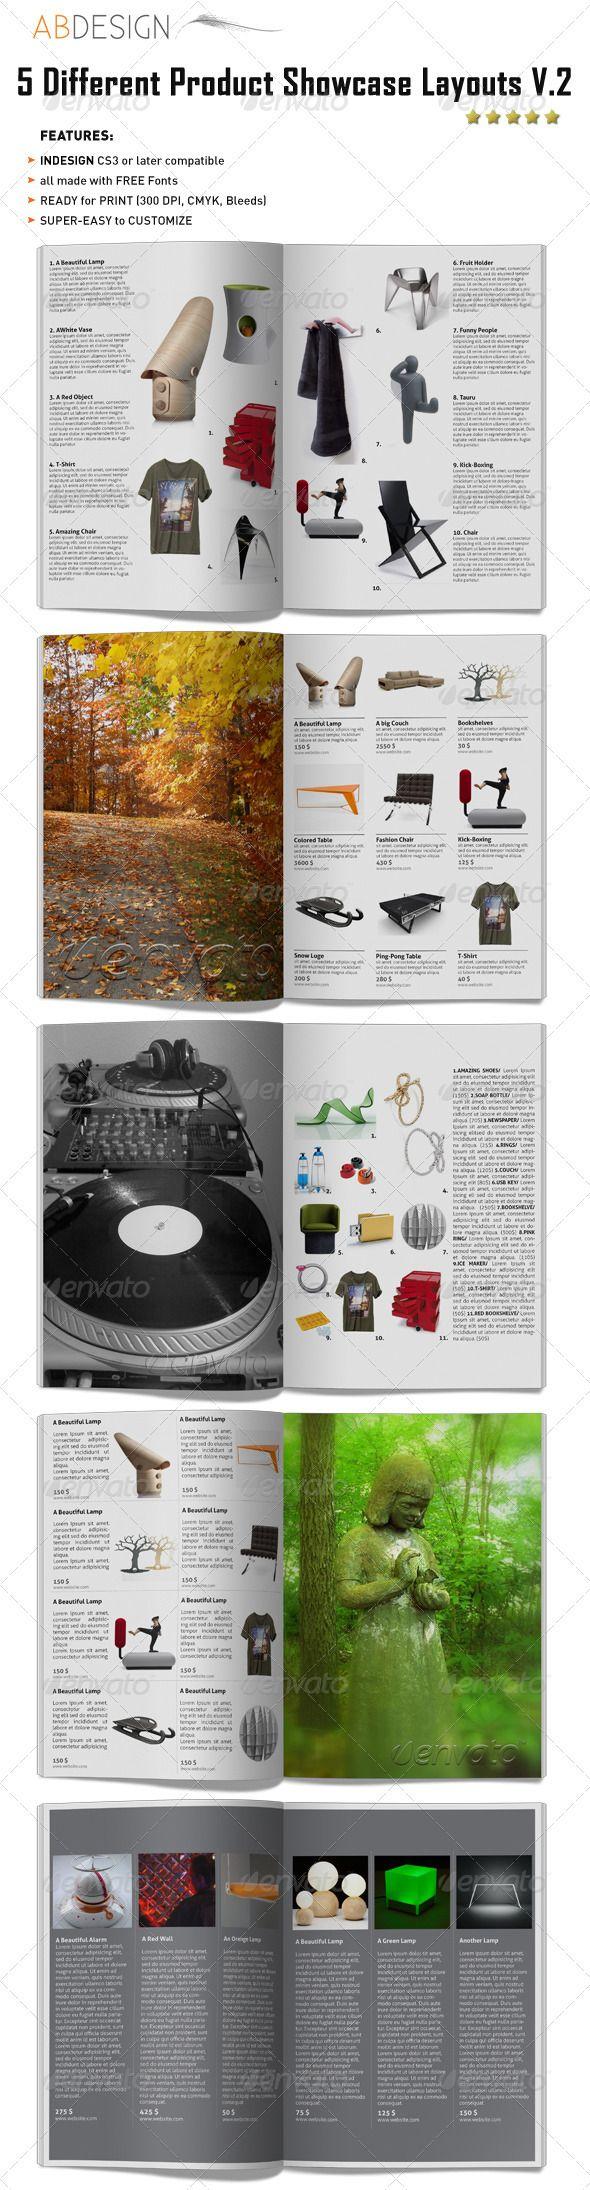 171 best Print Templates images on Pinterest | Print templates, Font ...